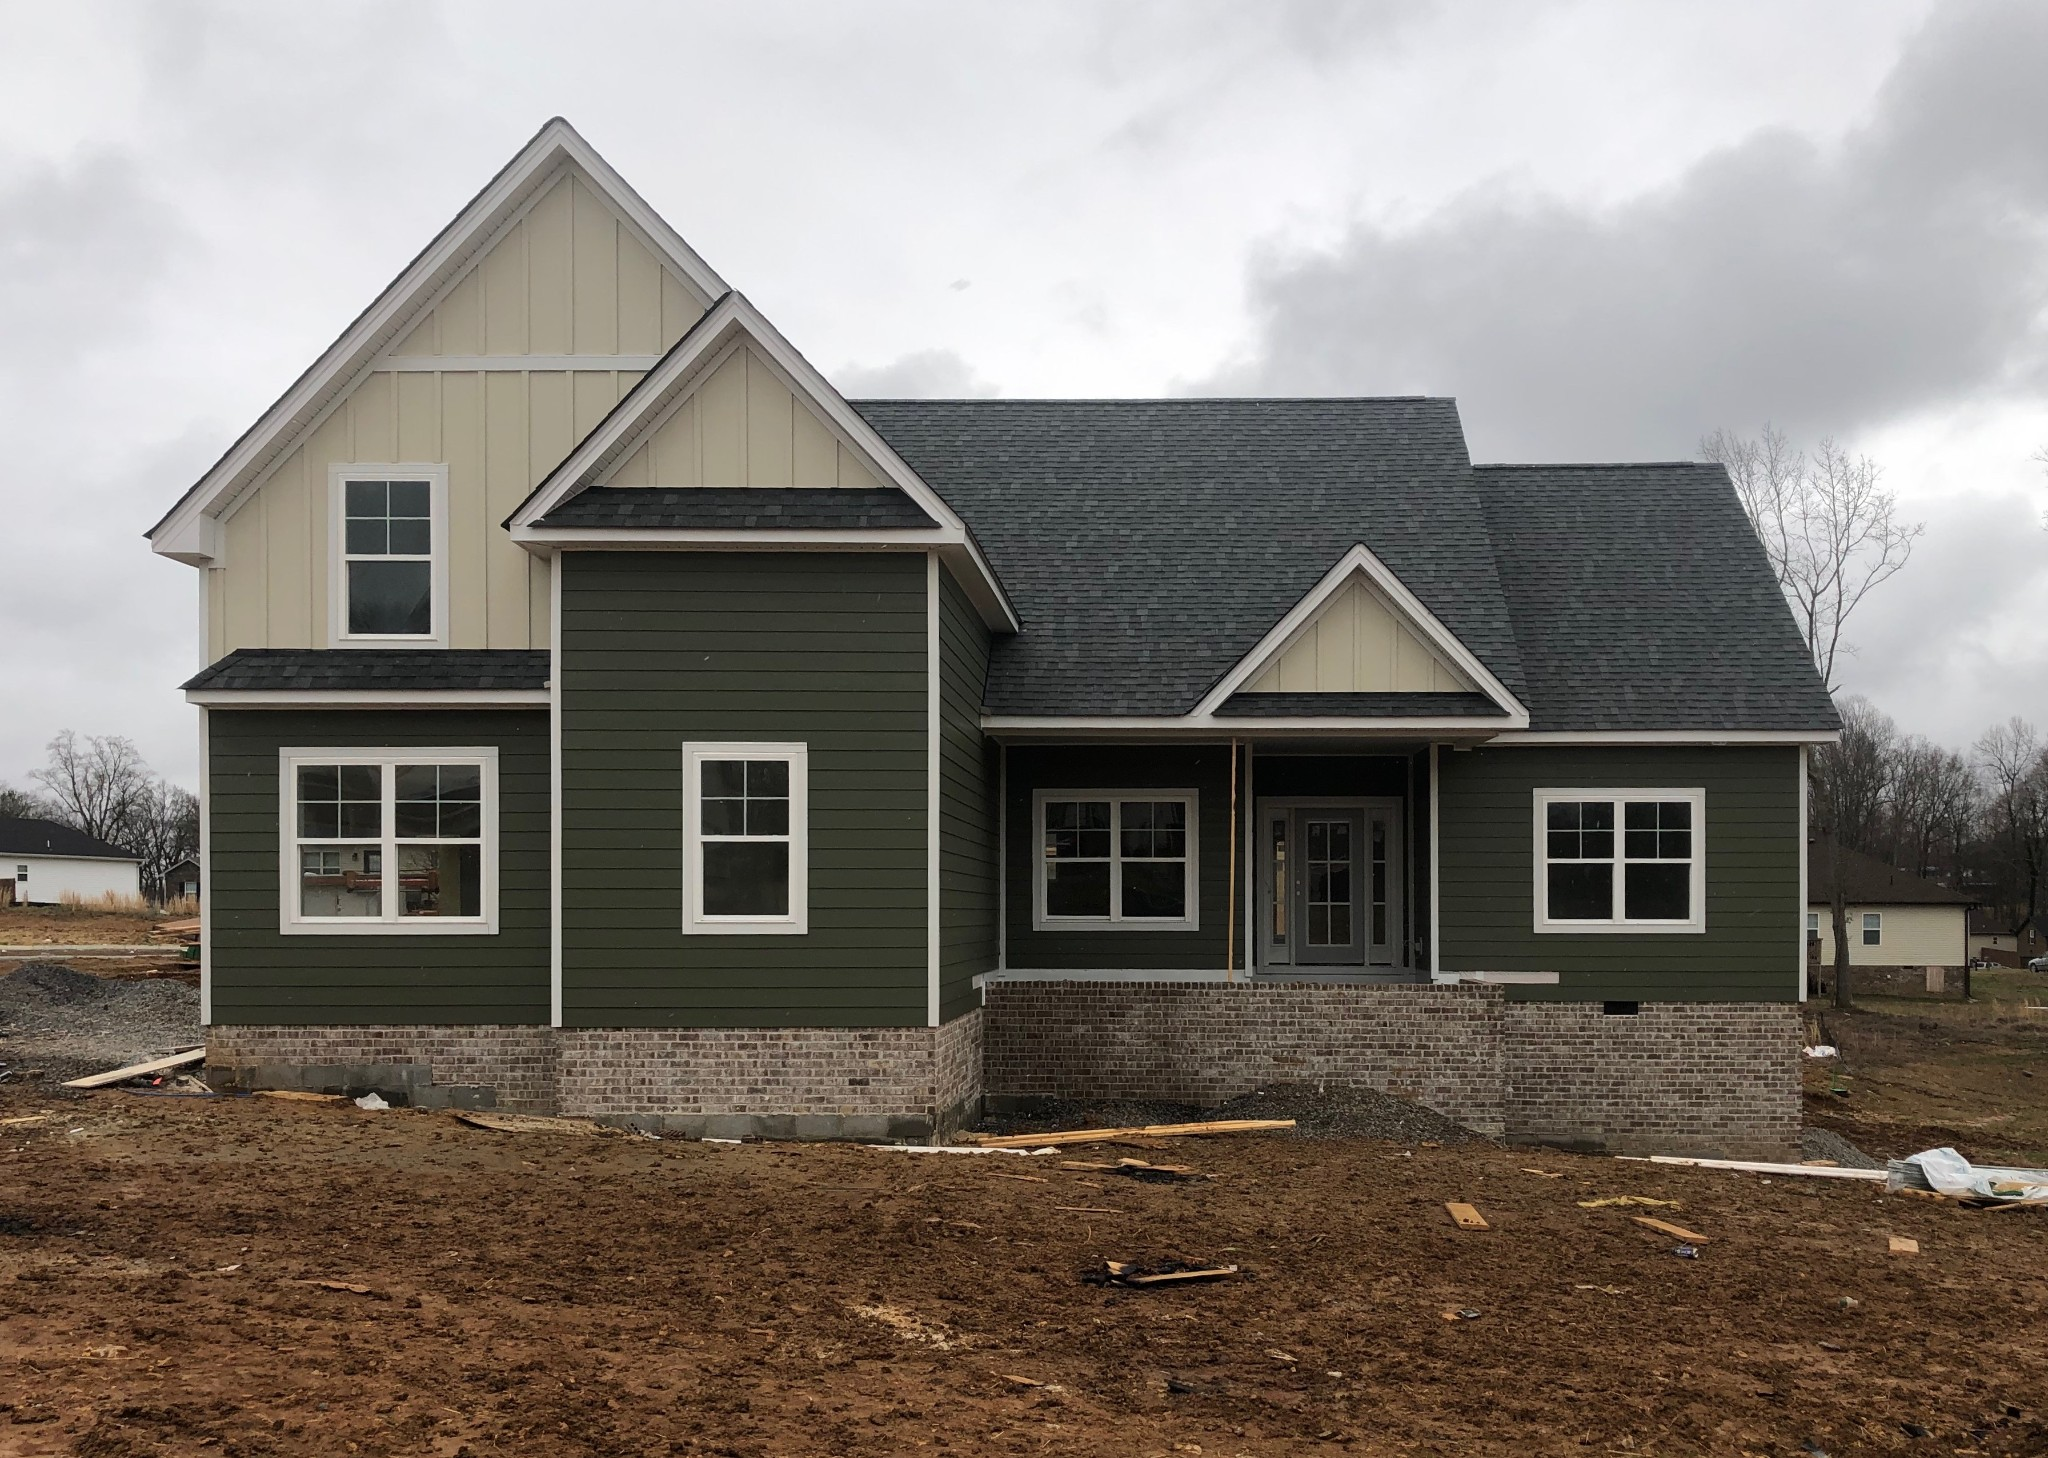 14 Stoneybrook, Cross Plains, TN 37049 - Cross Plains, TN real estate listing